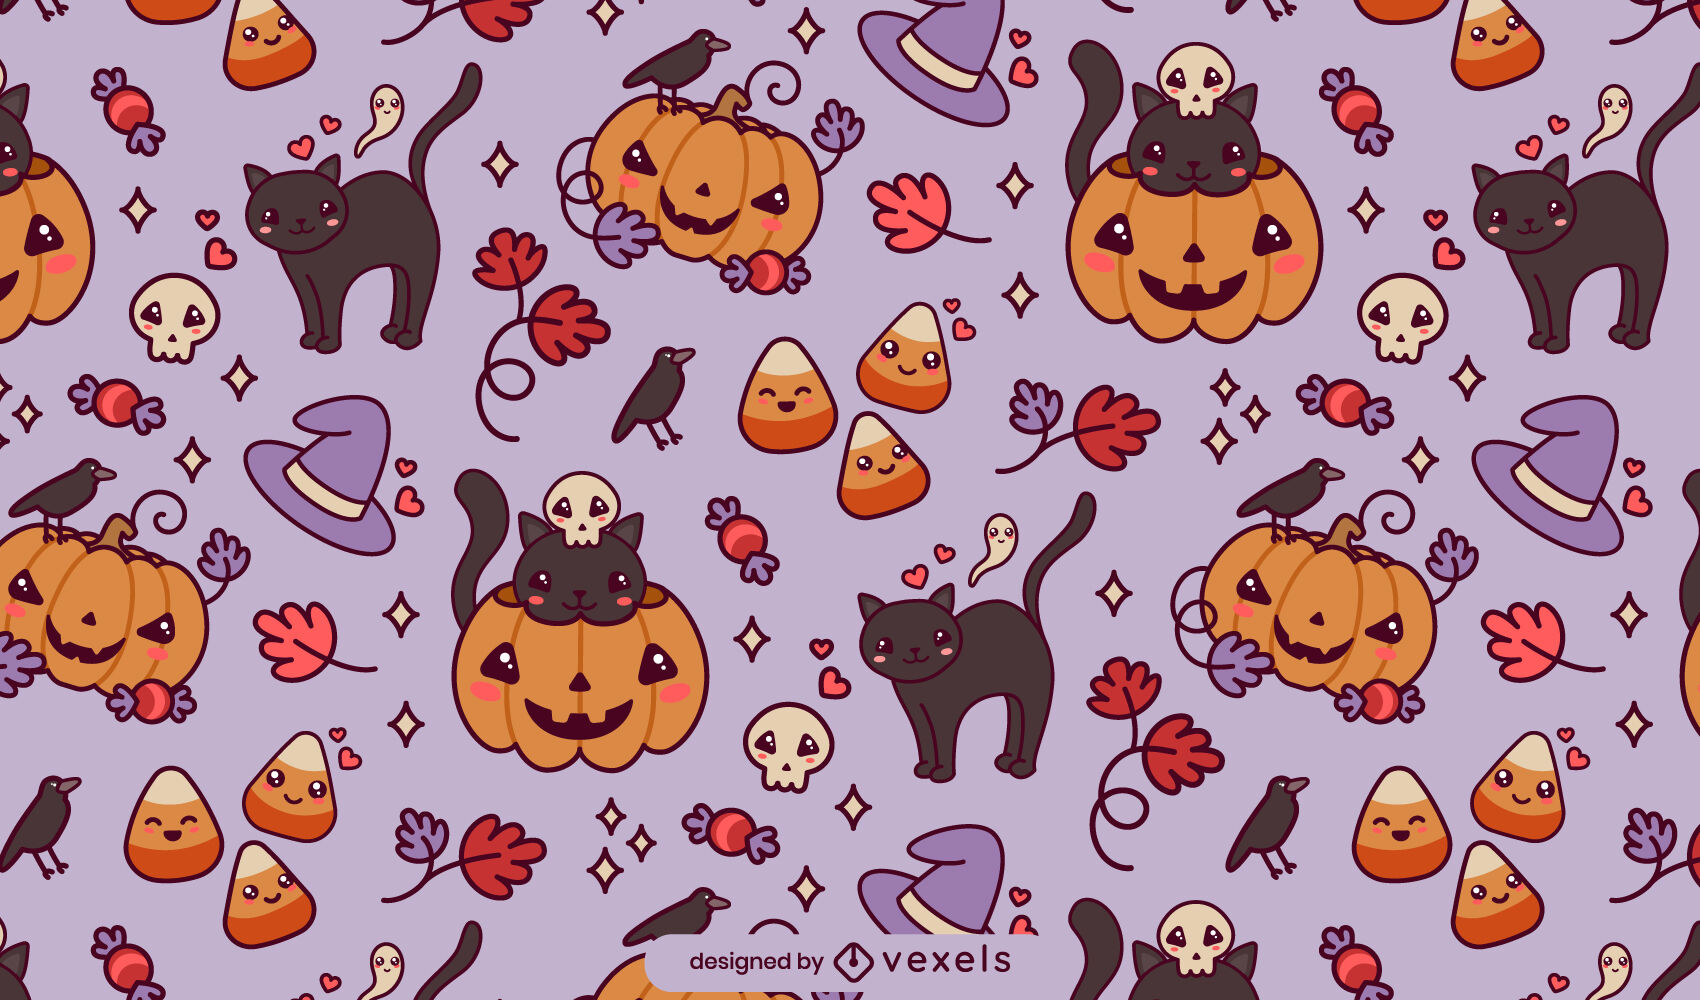 Cute Halloween pattern design